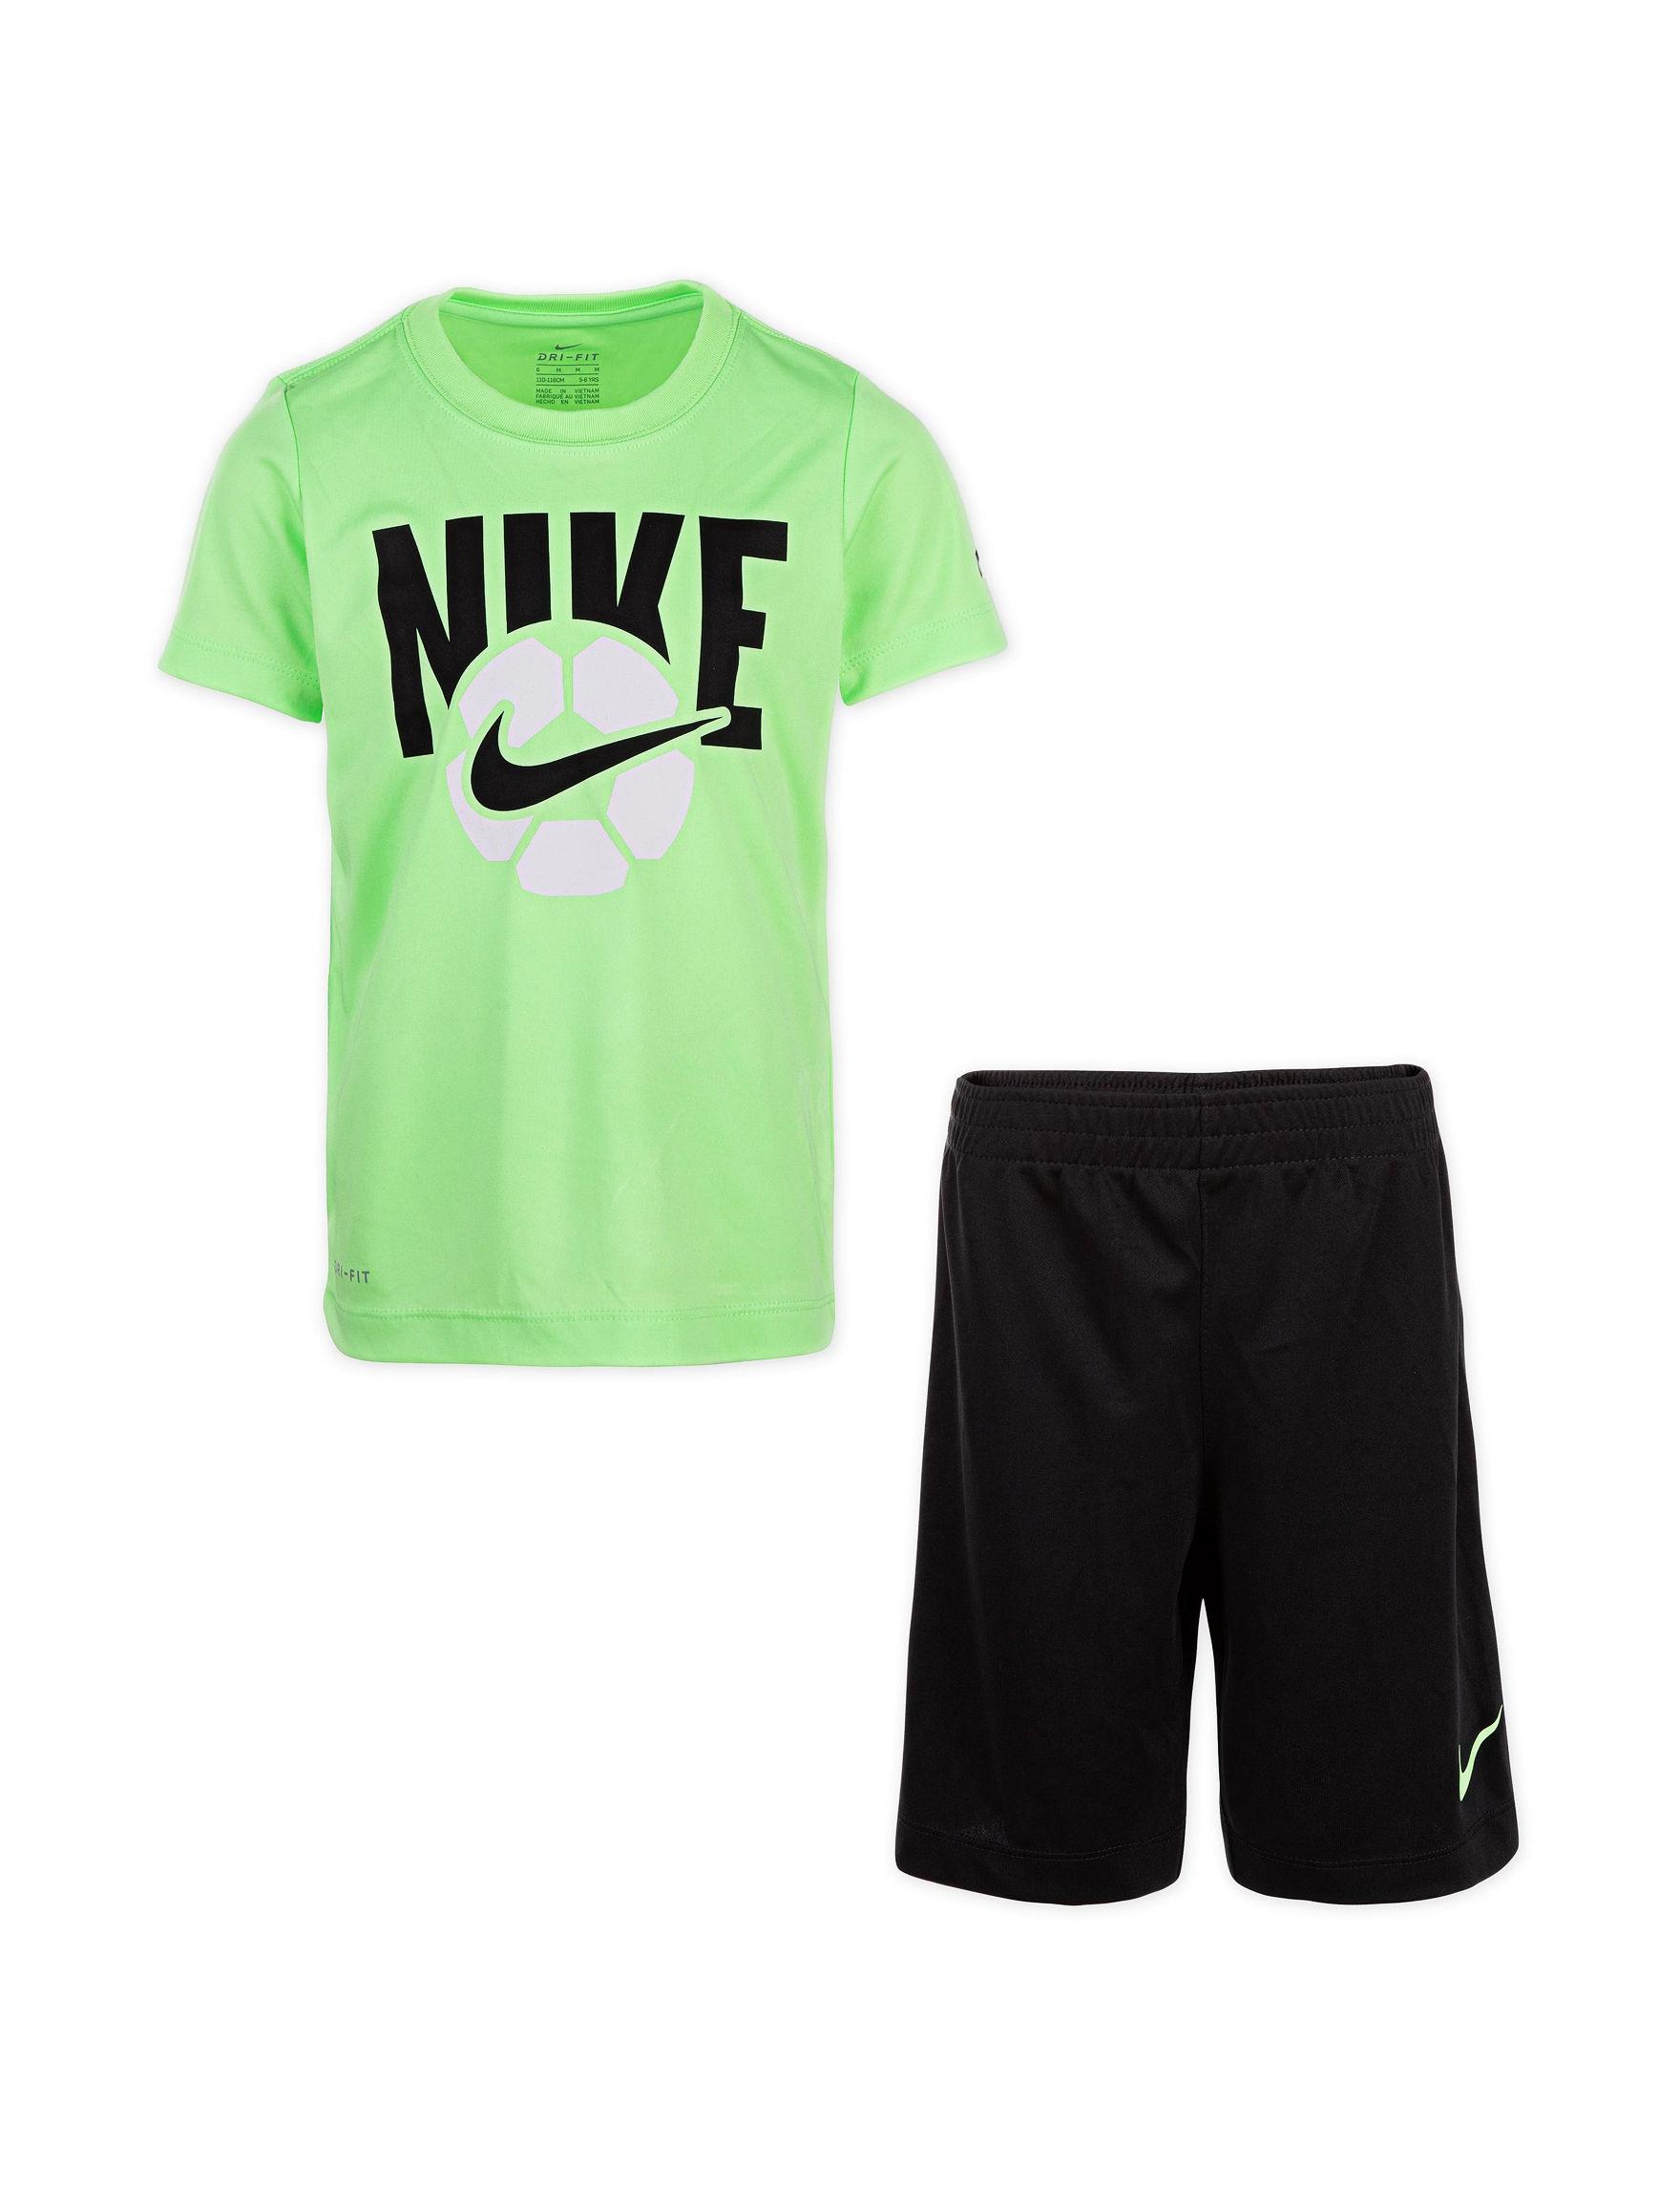 aecc3ea21 Nike 2-pc. Dri-FIT Soccer Ball Graphic T-shirt & Shorts Set - Toddler Boys